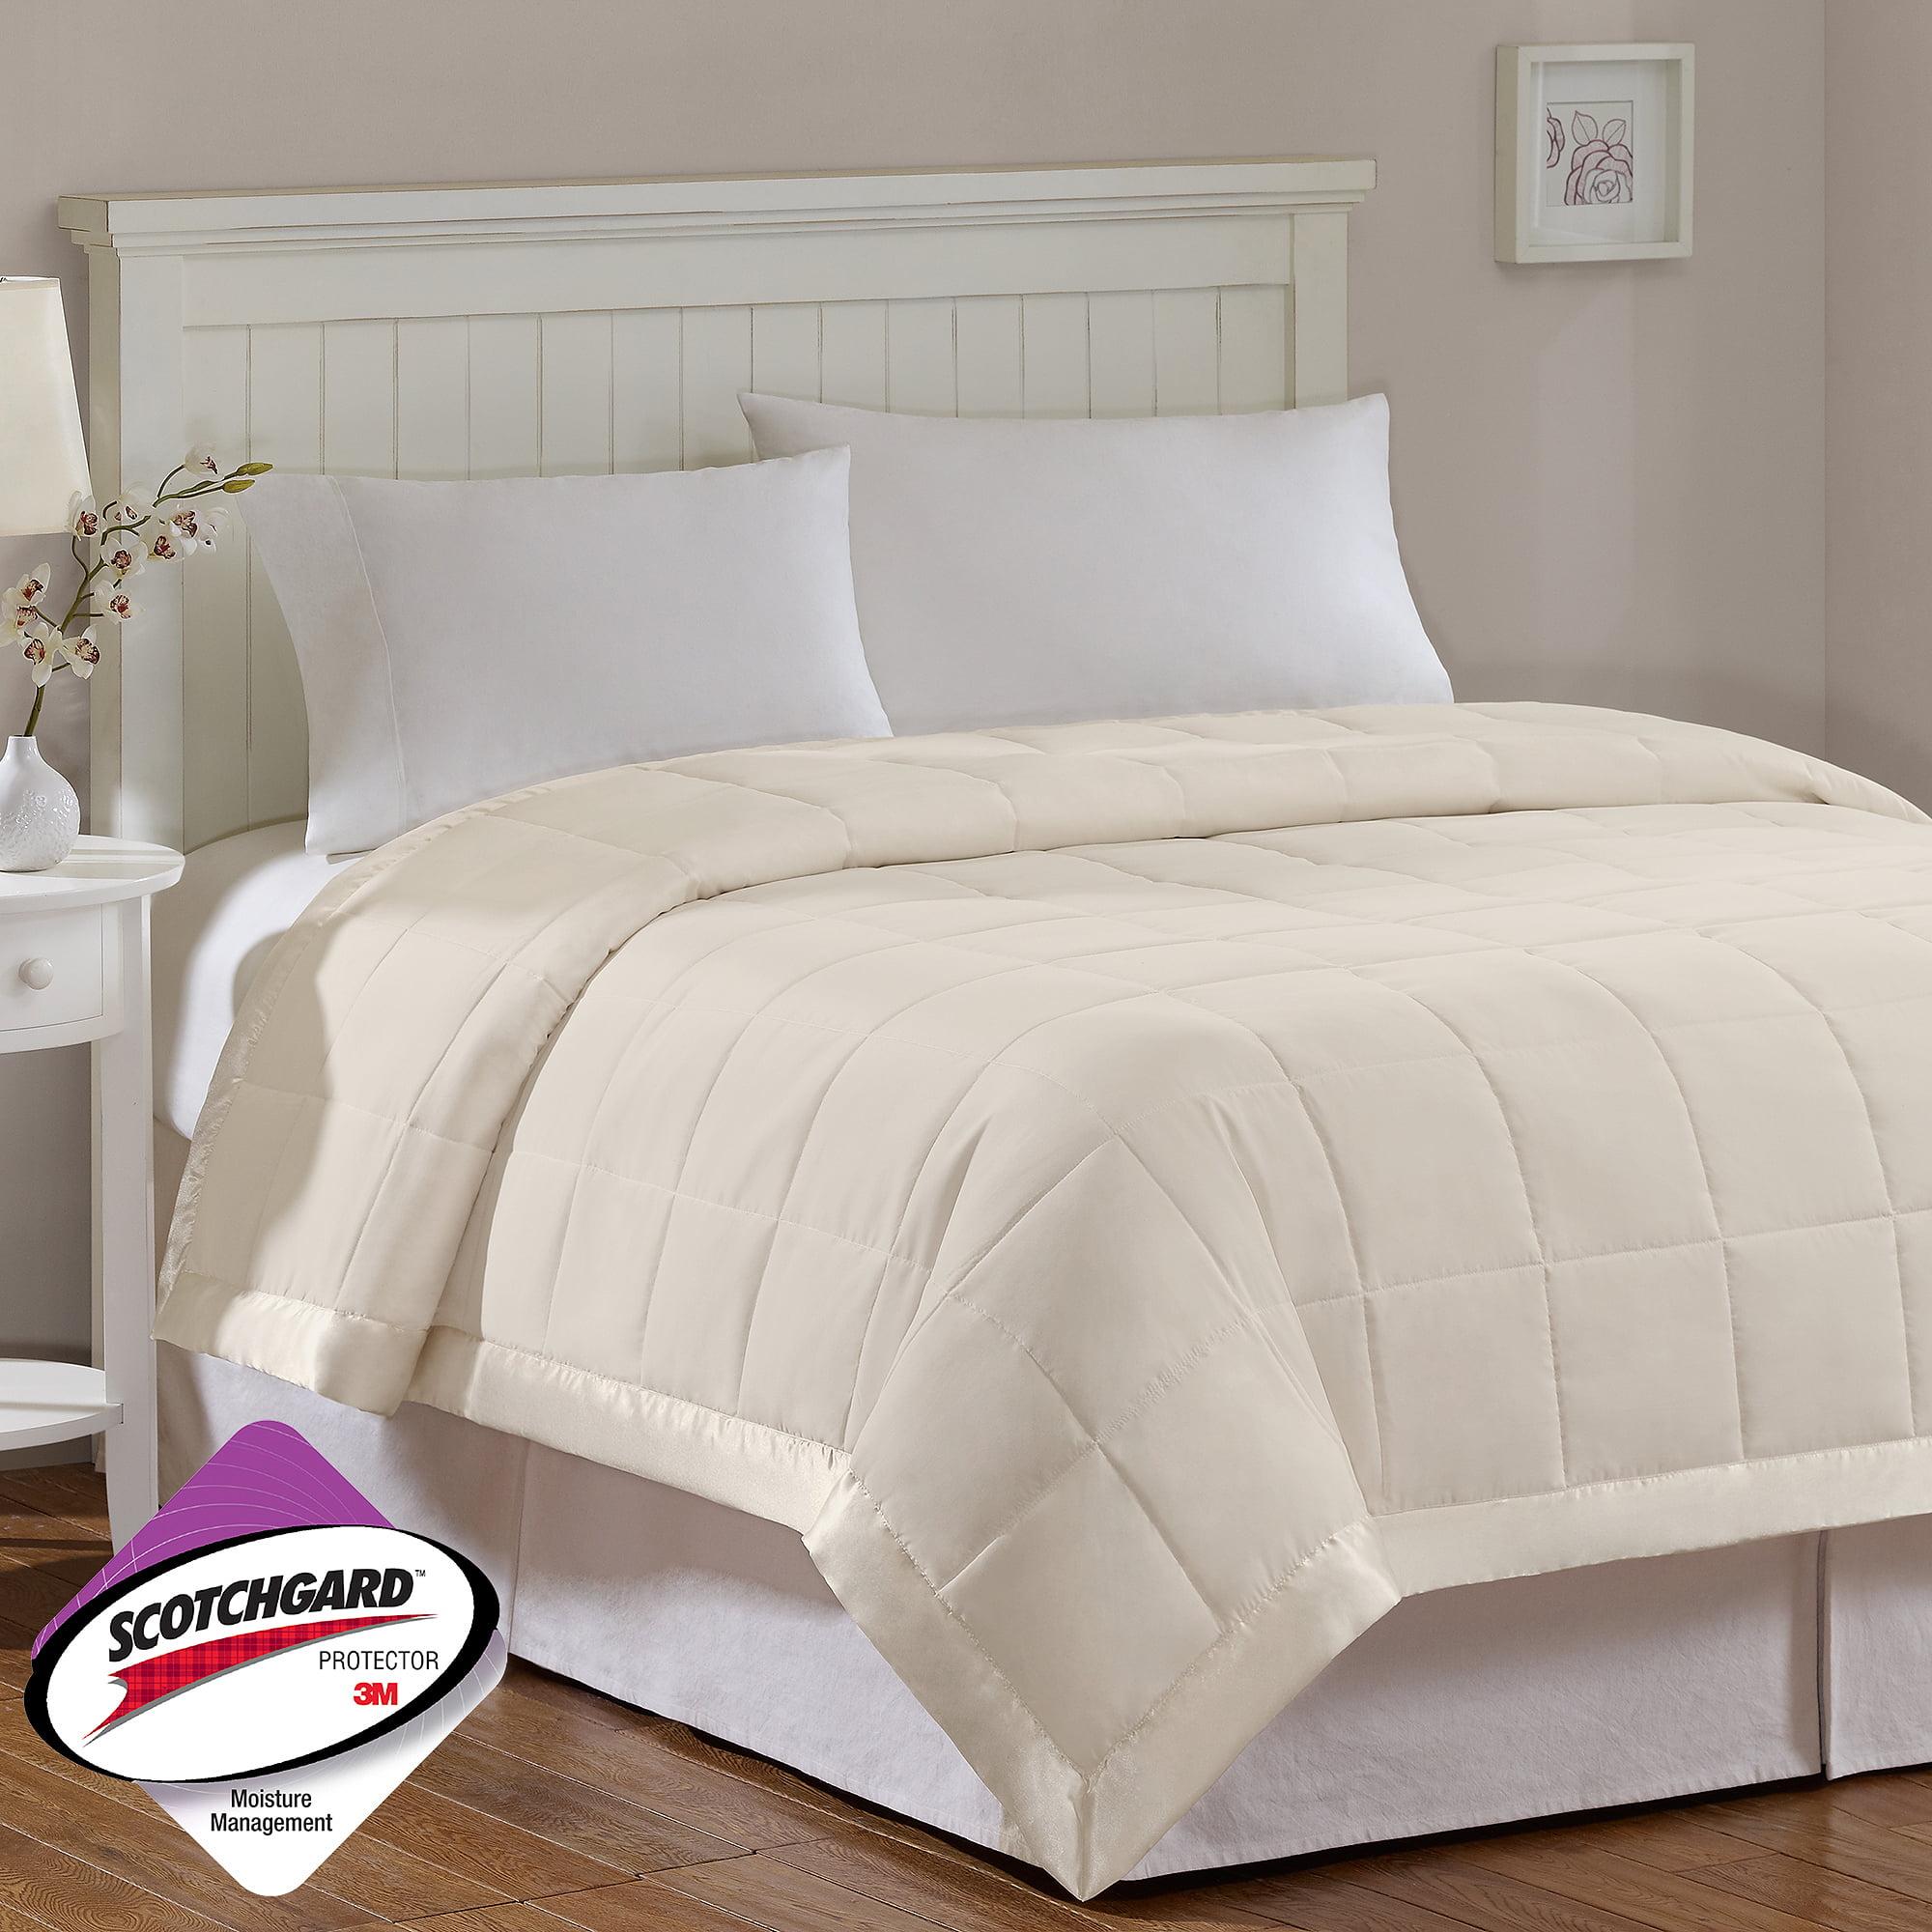 Comfort Classics Prospect 3M Moisture Management Down Alternative Blanket